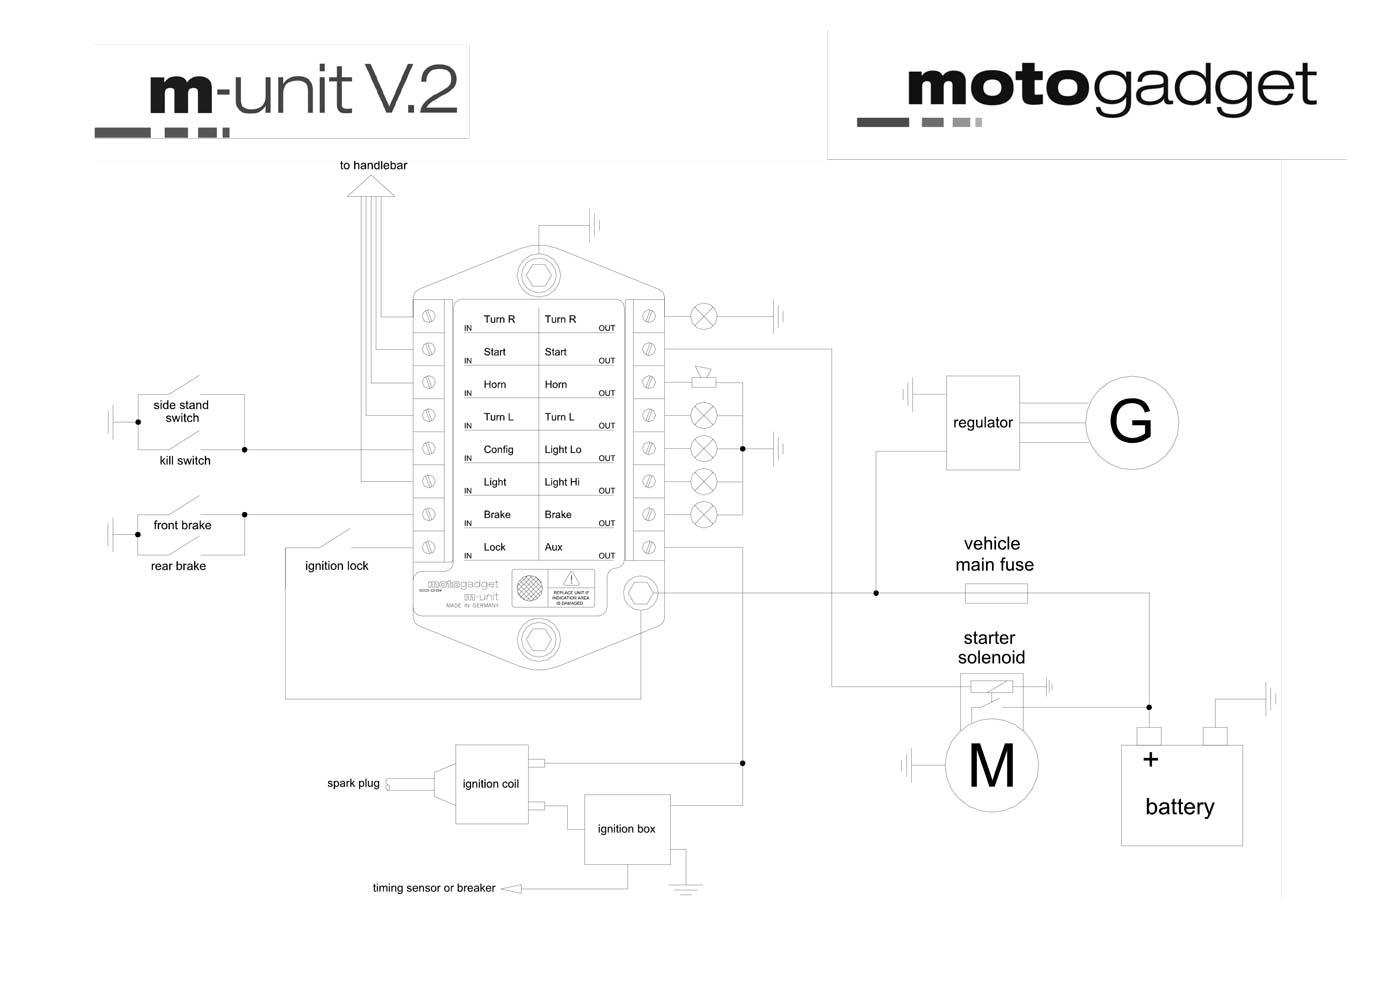 Motogadget Wiring Diagram